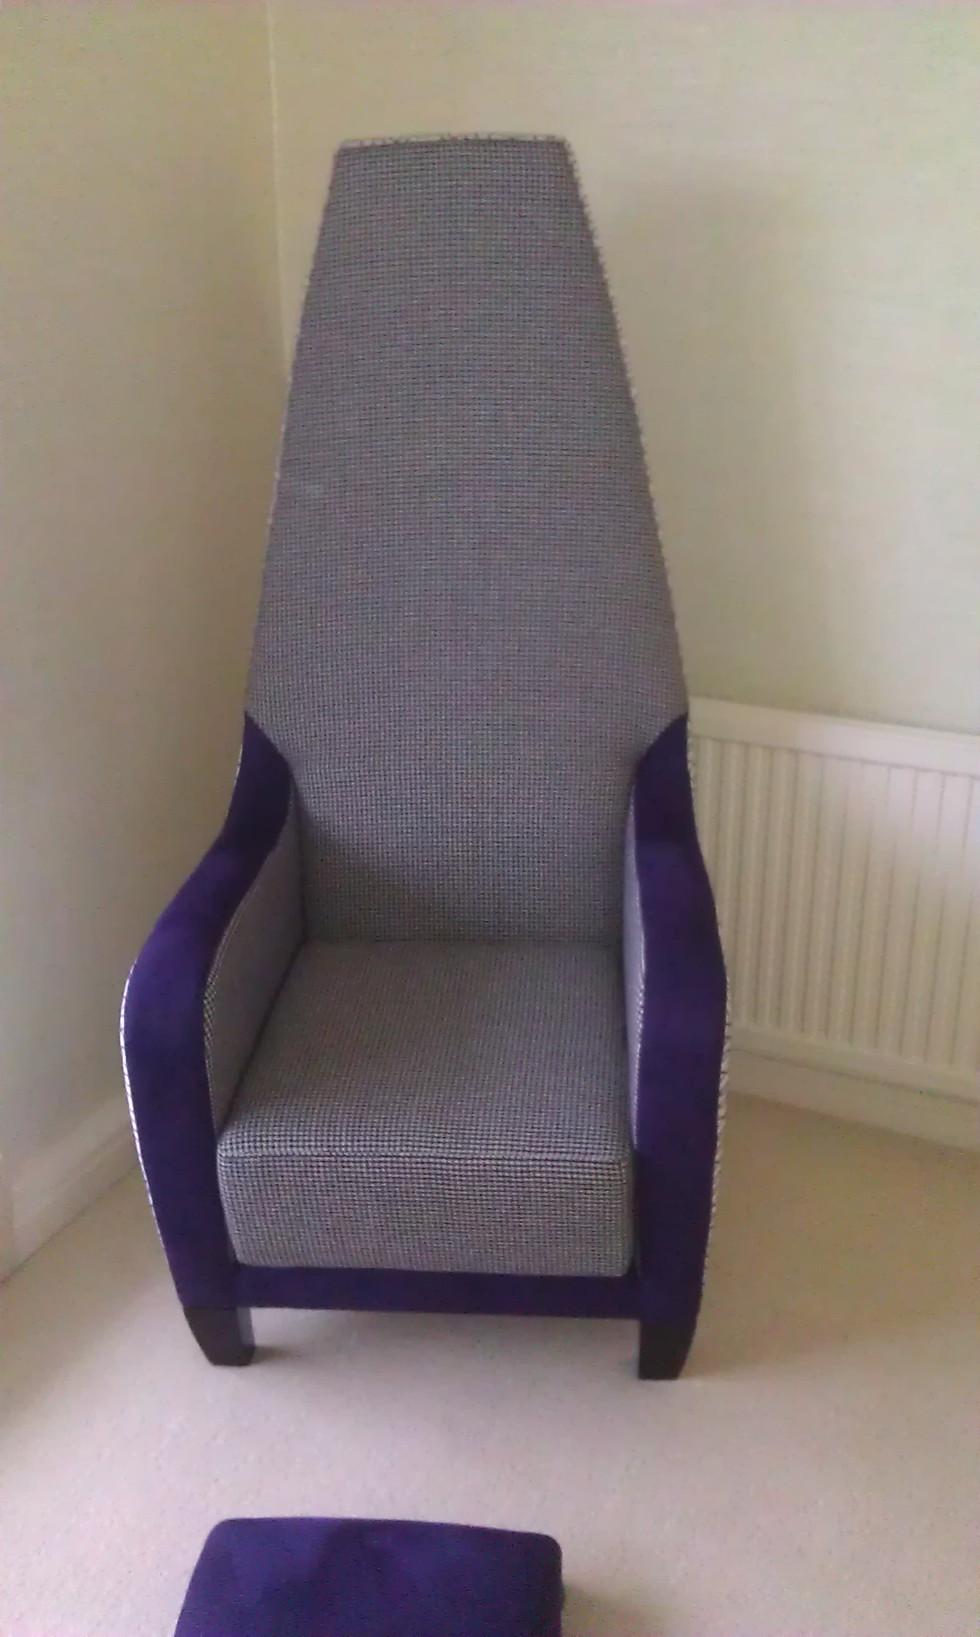 Upholstered High Back Chair della-Porta design